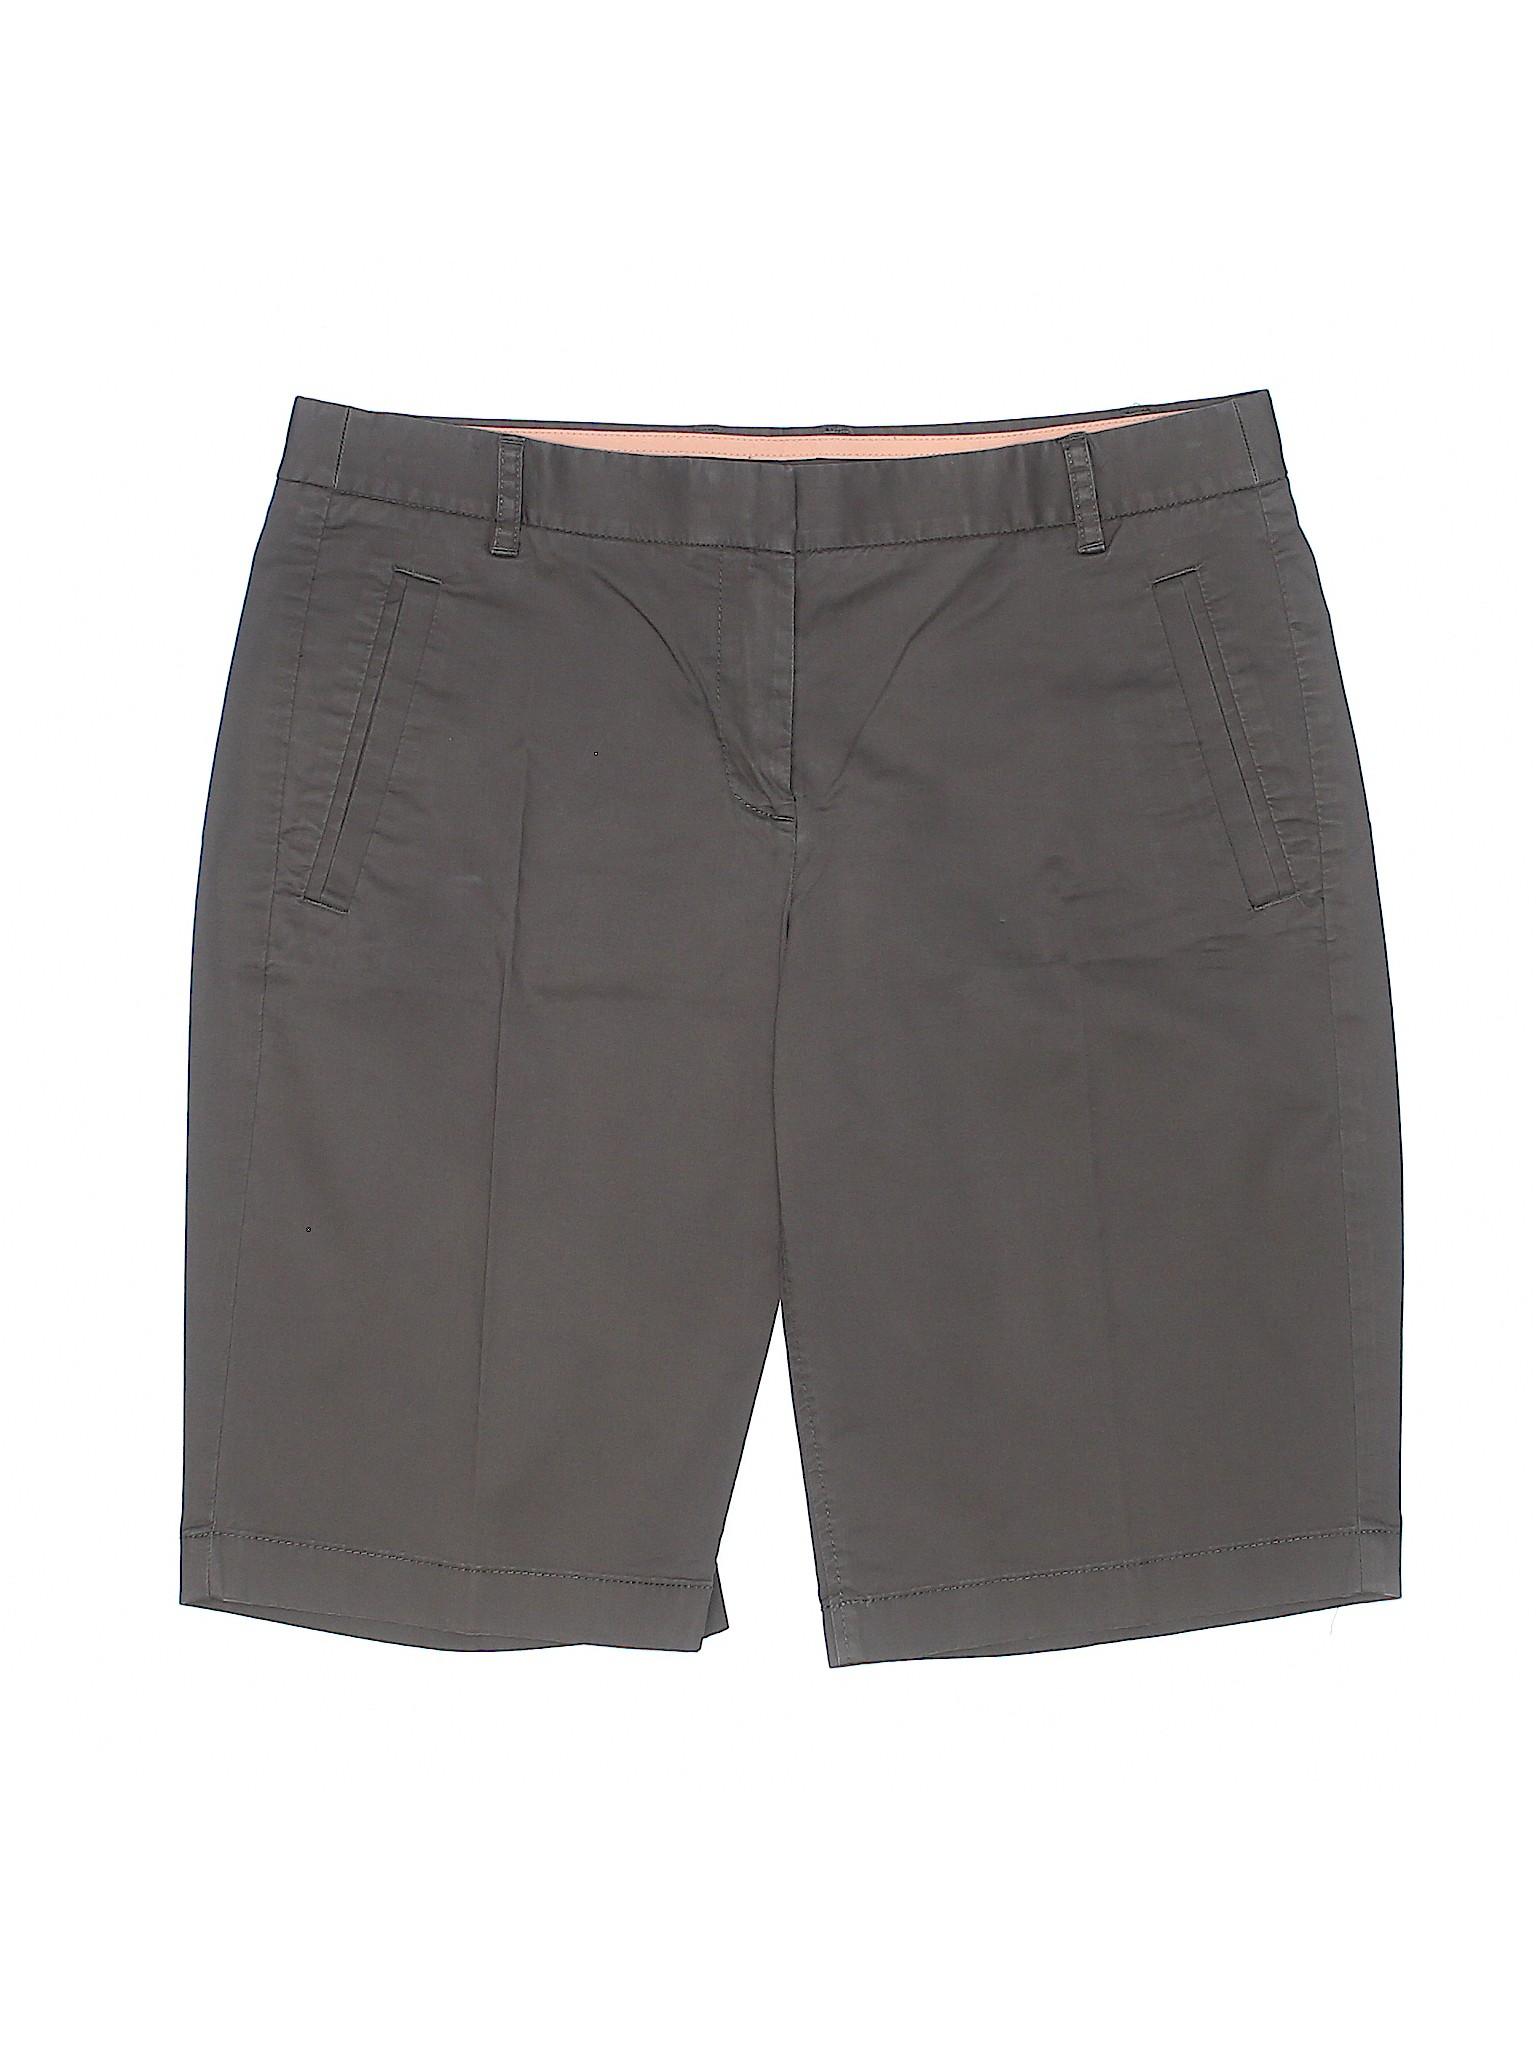 J Crew Boutique leisure Khaki Shorts qznOCw